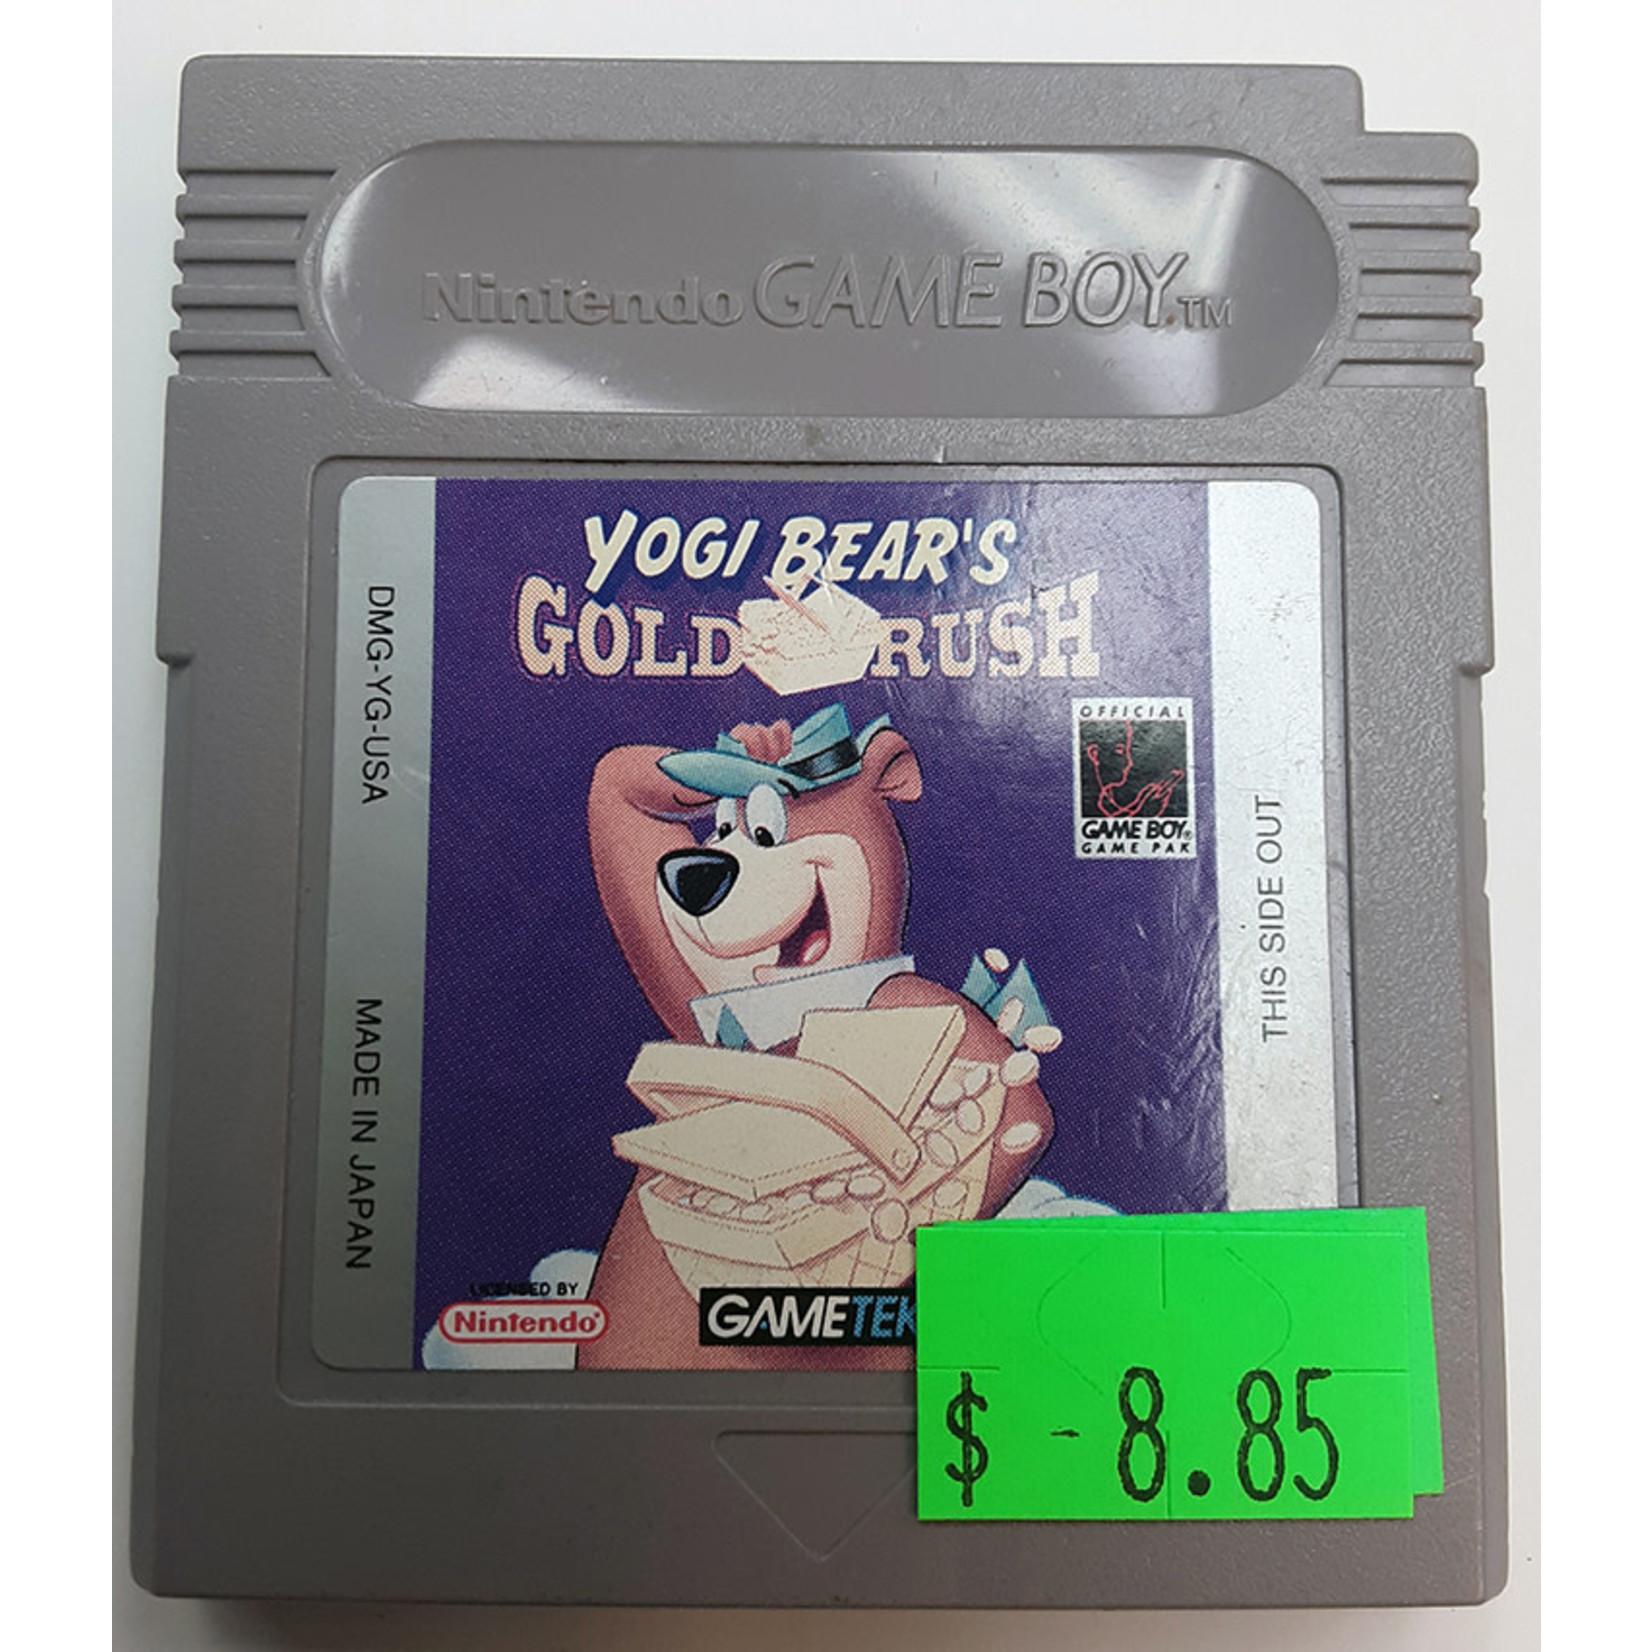 GBu-Yogi Bear's Gold Rush (cartridge)